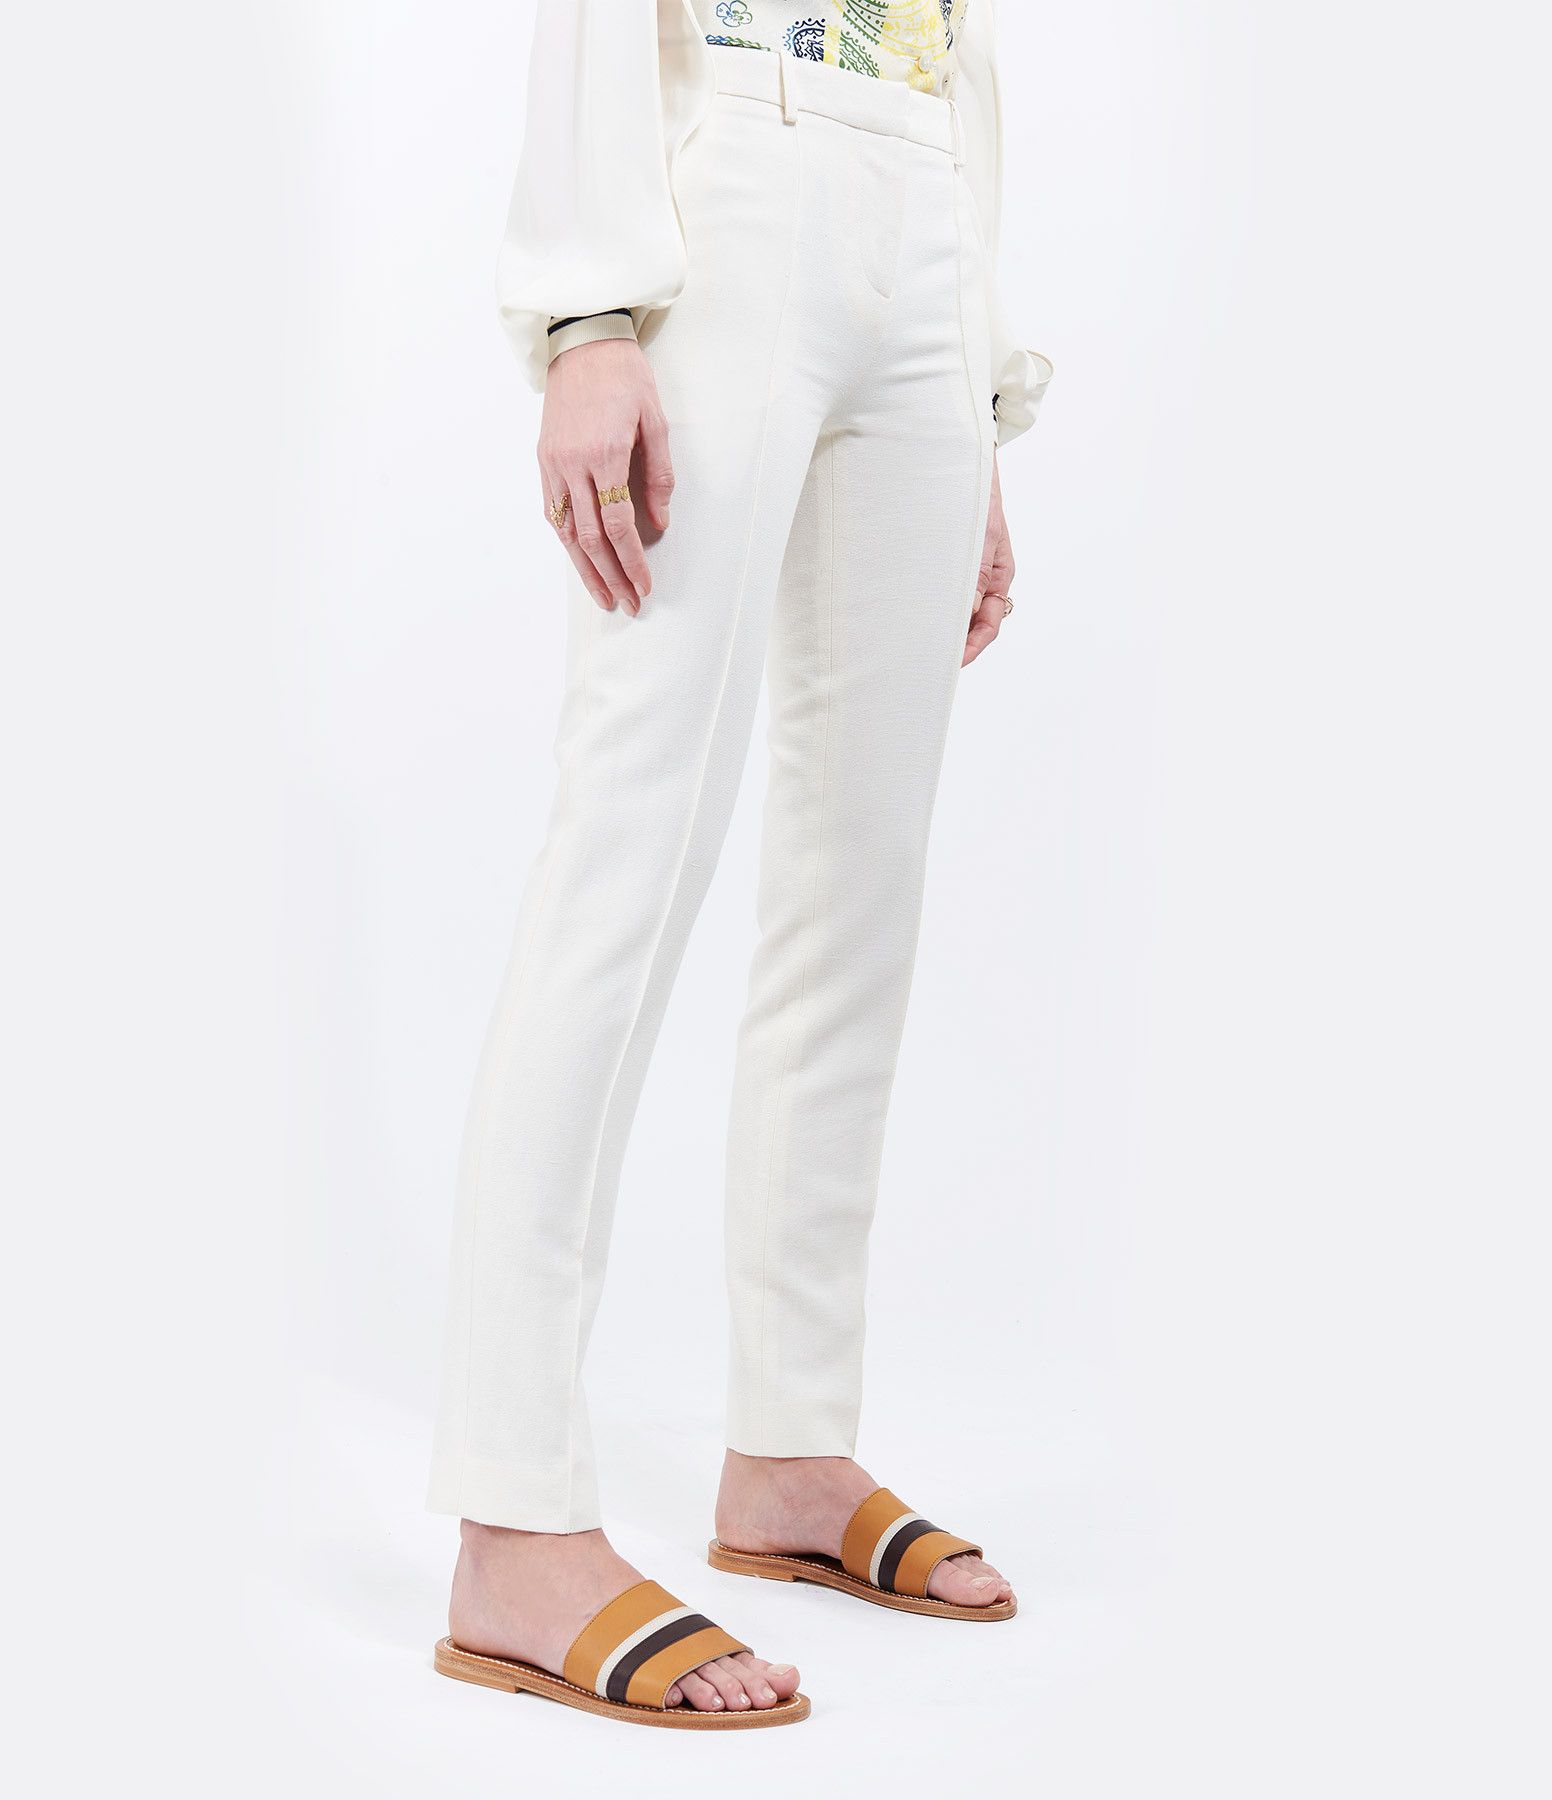 VANESSA BRUNO - Pantalon James Coton Crème